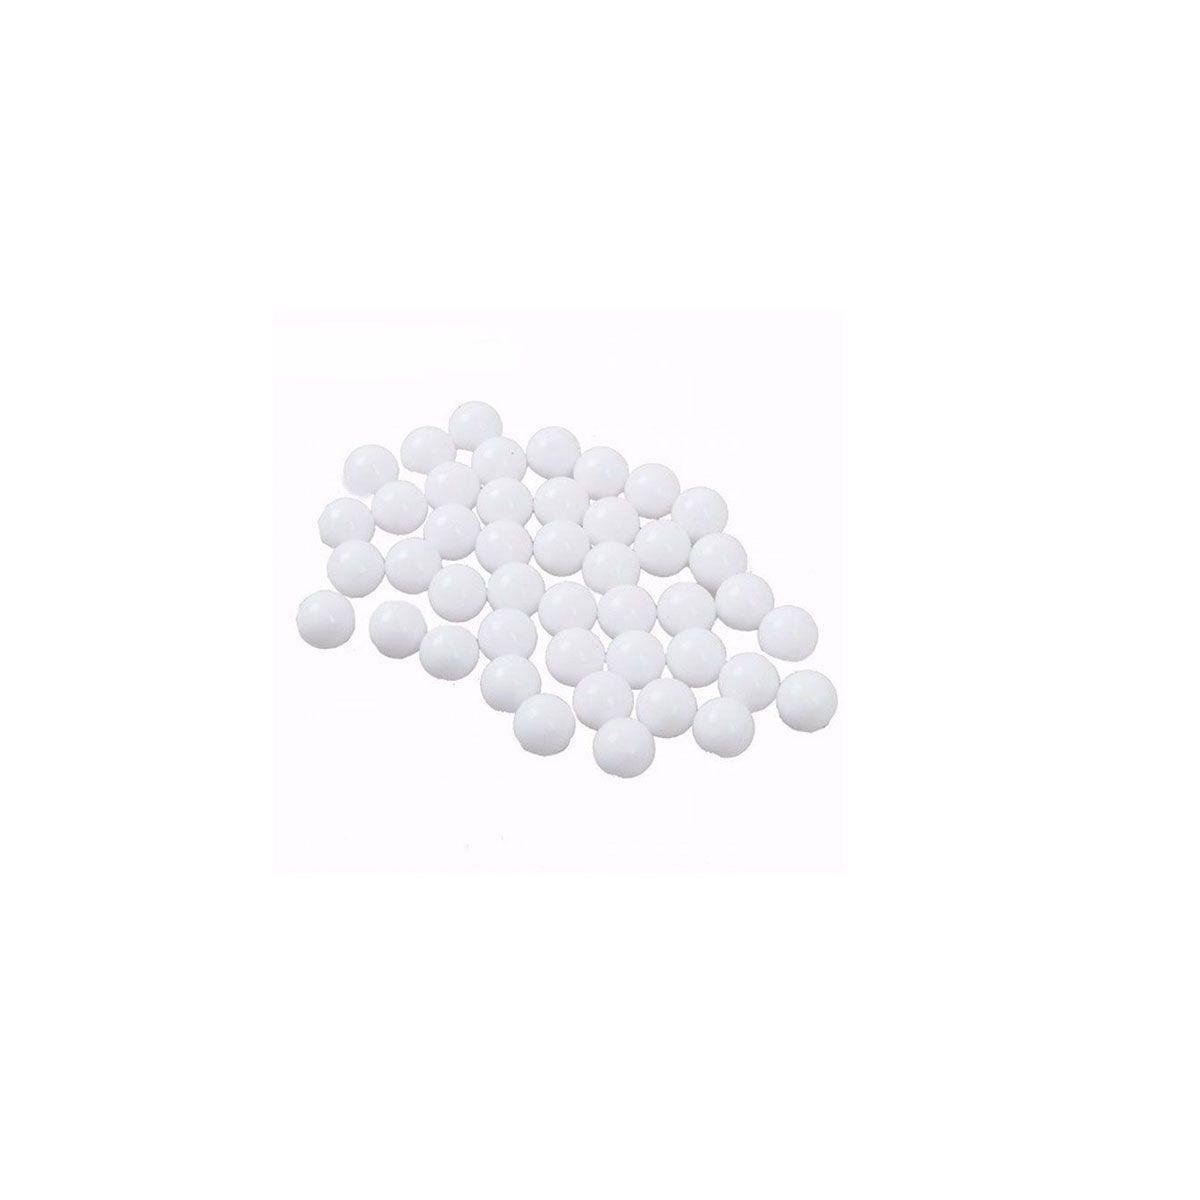 Esferas plásticas BBs Parabellum Calibre 6 mm 0.28G 2500un